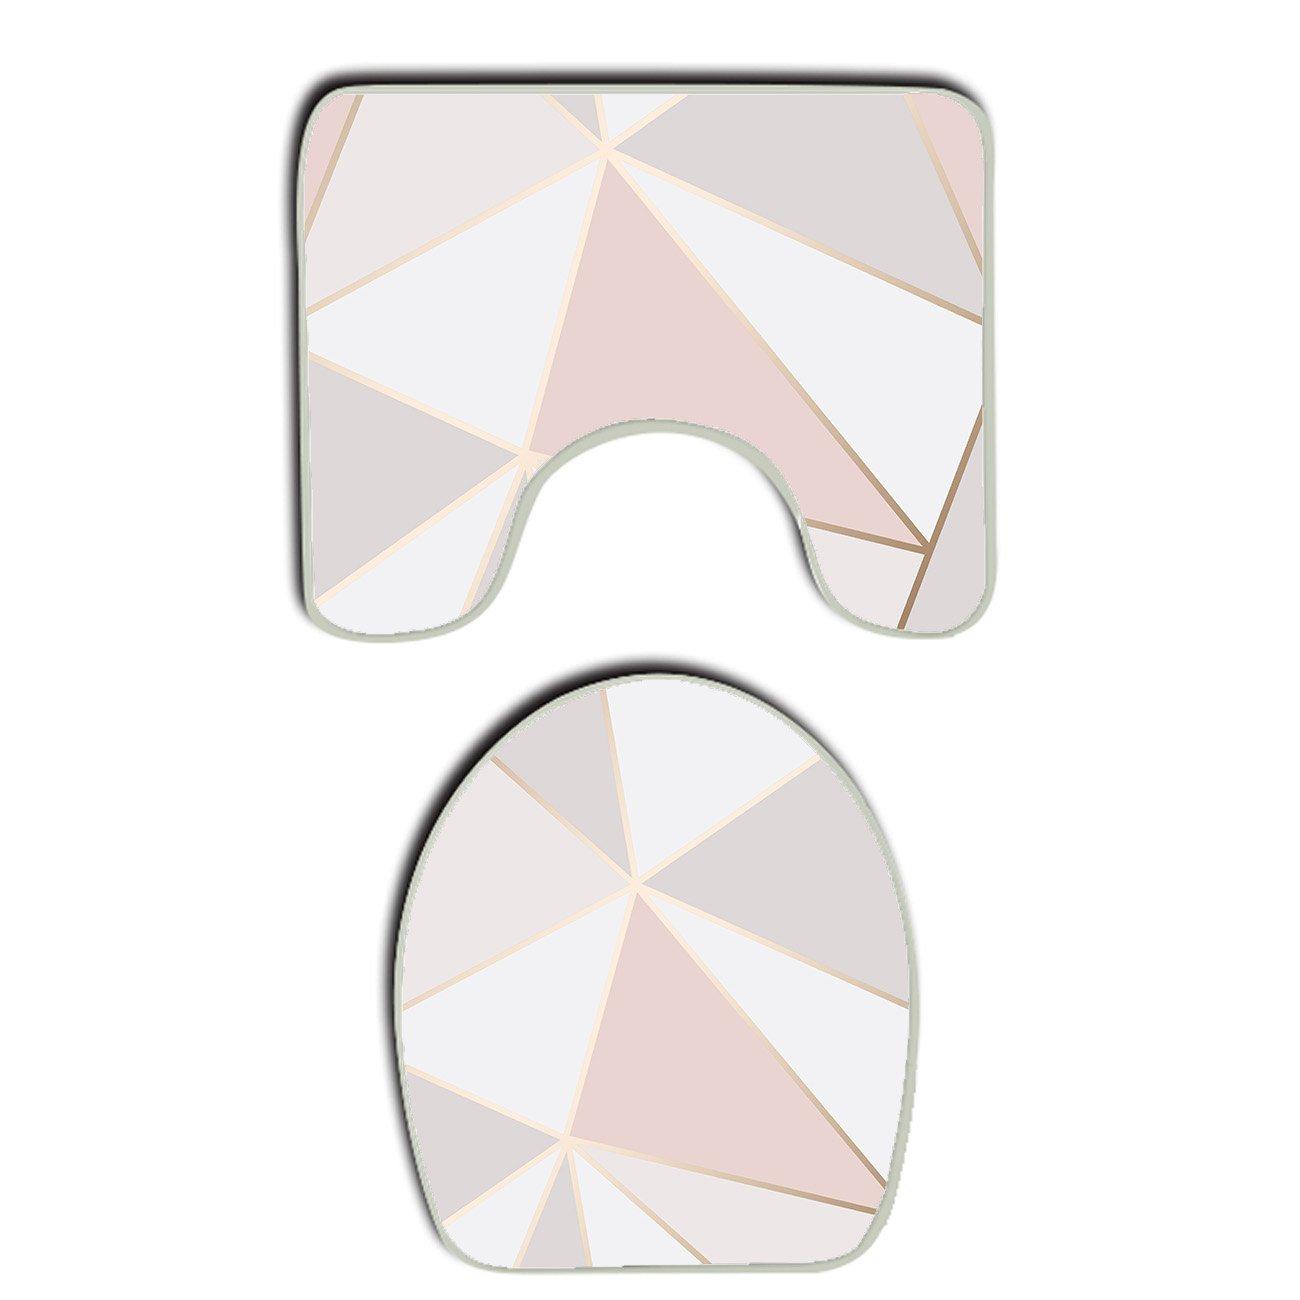 AMERICAN TANG Rose Gold Geometric mirror Pattern Bathroom Carpet Rug, Non-Slip 2 Piece Bathroom Mat Set Decoration